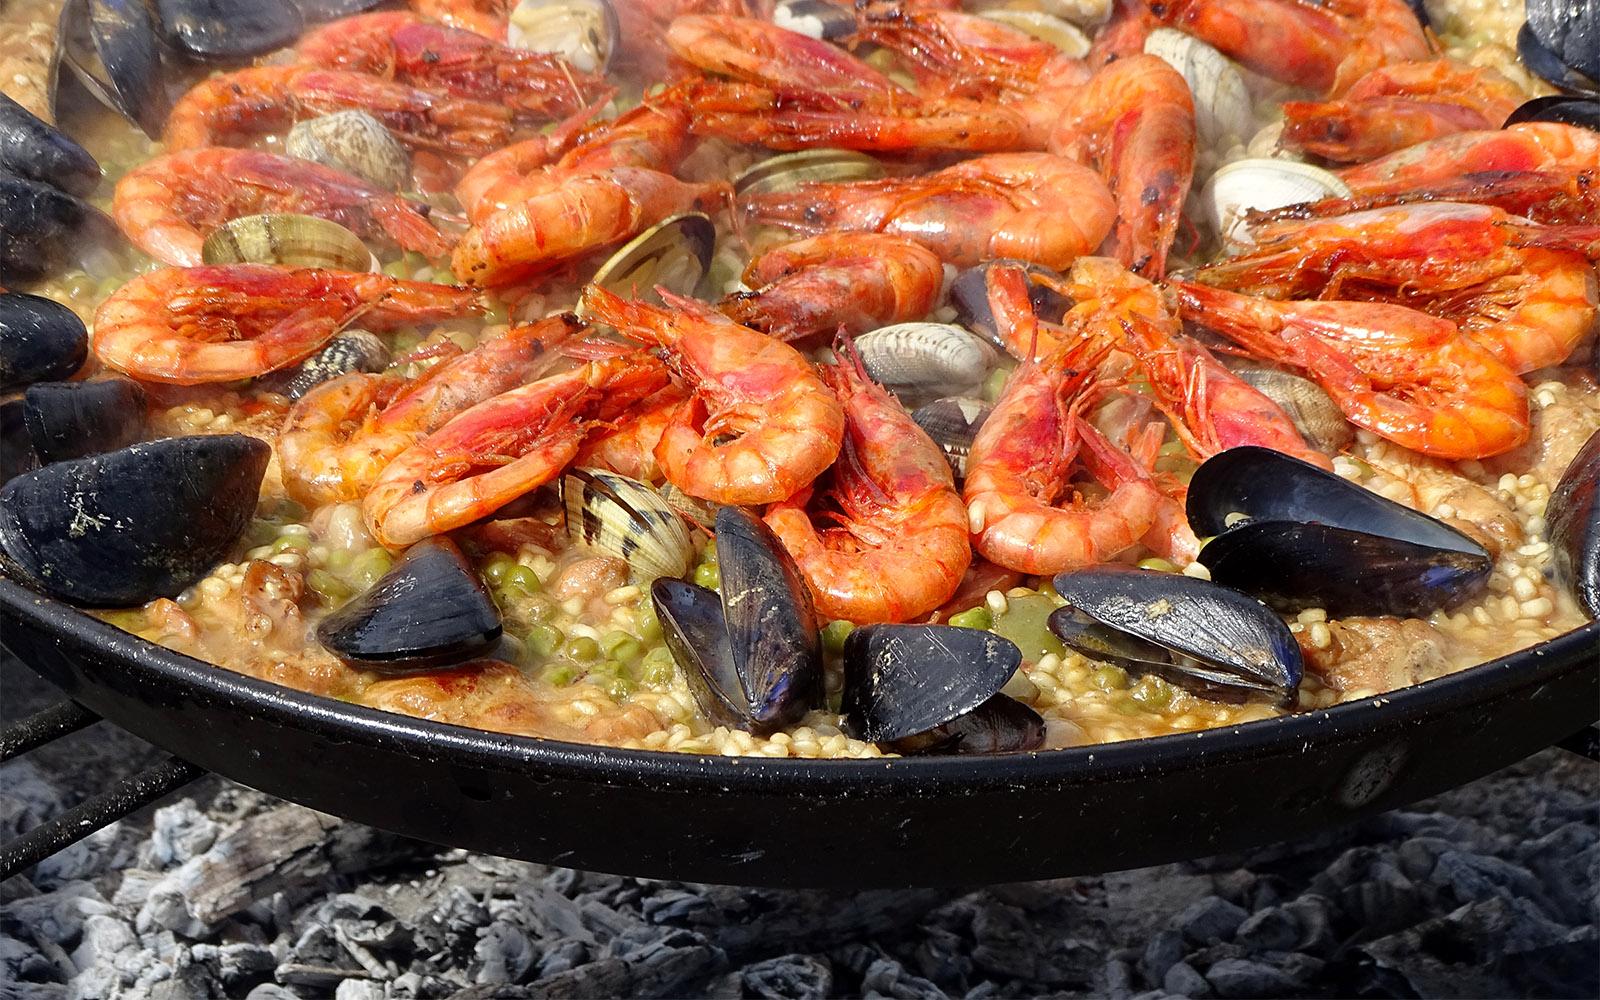 Turismo Alcossebre. Paella de Alcalá de Xivert